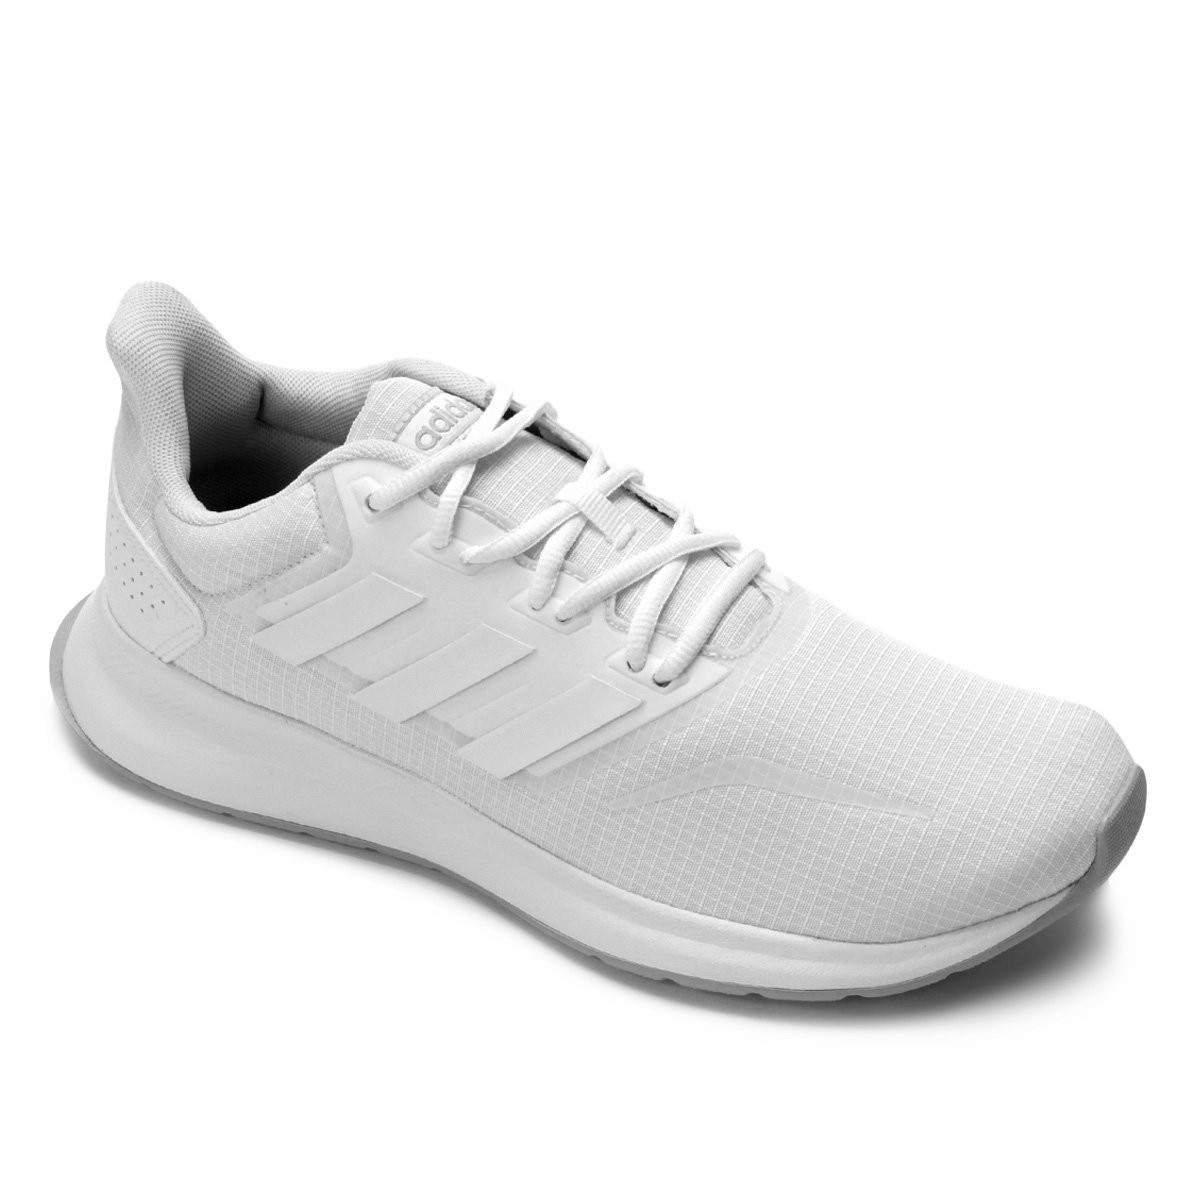 92522d3d6c Tênis Adidas Falcon Masculino - Branco - Compre Agora